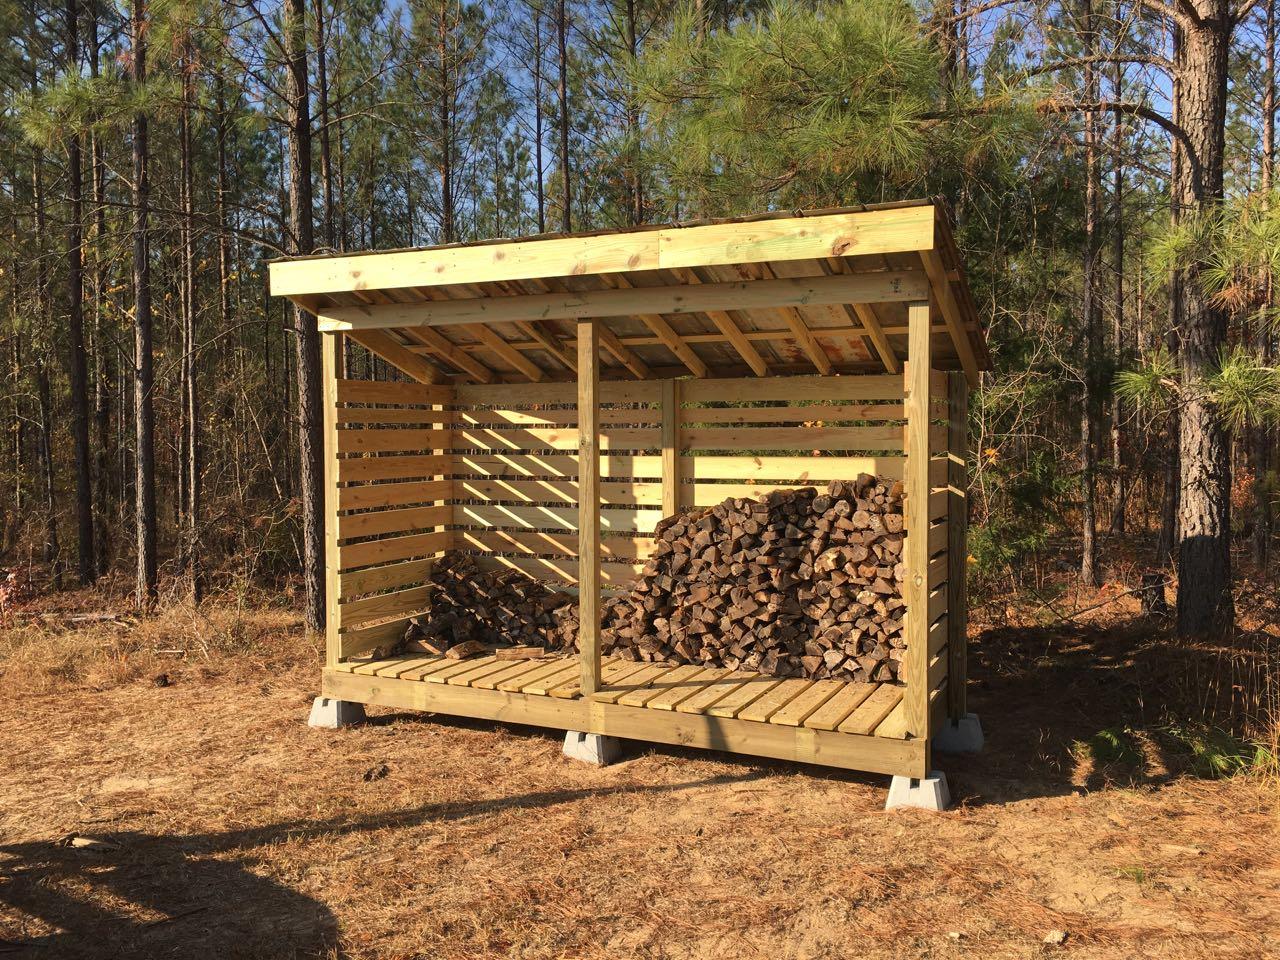 wood shed iv.jpg KCALTZG